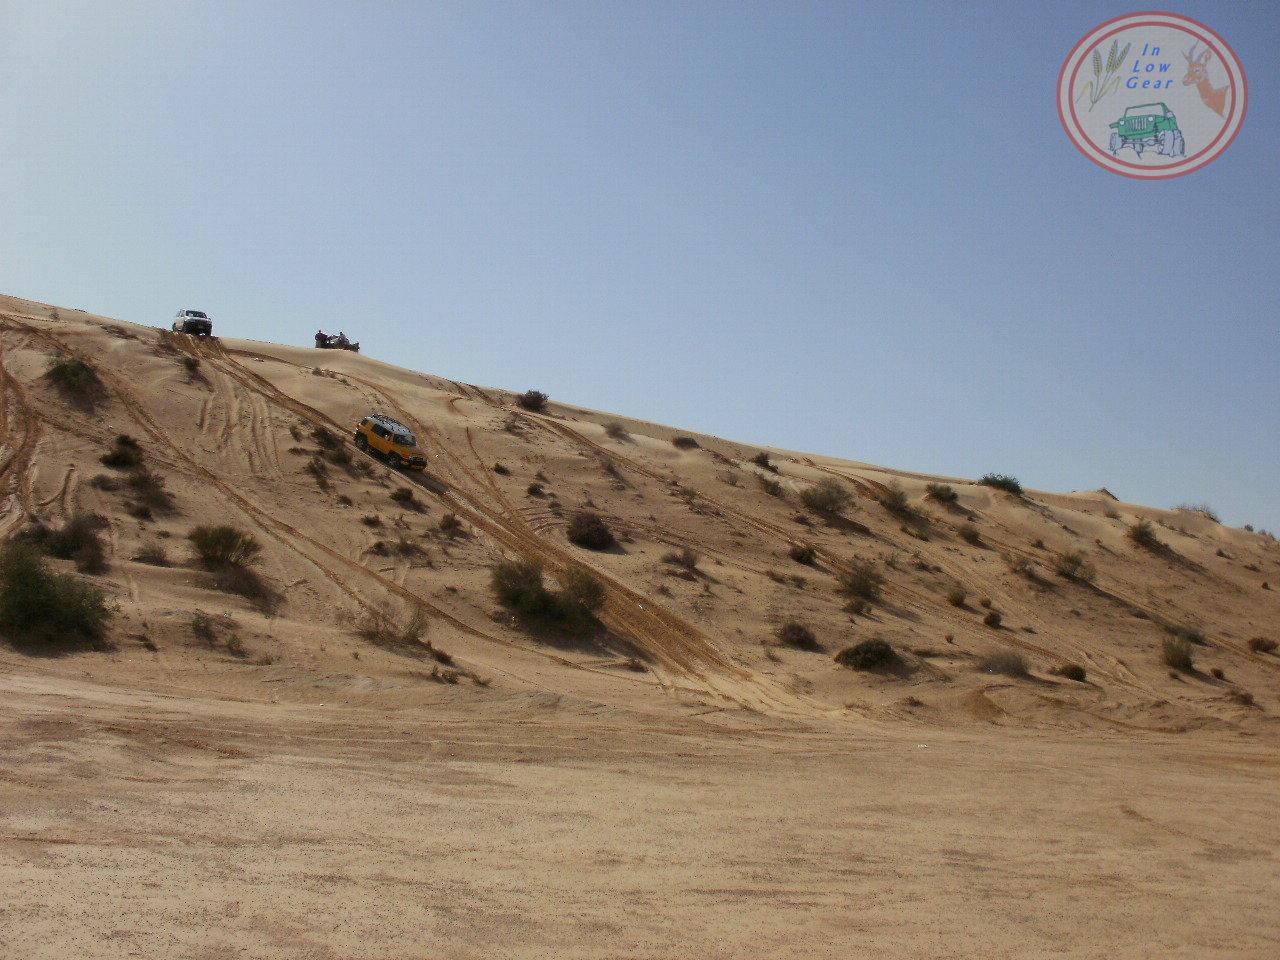 Holot Agur, Dekel dune